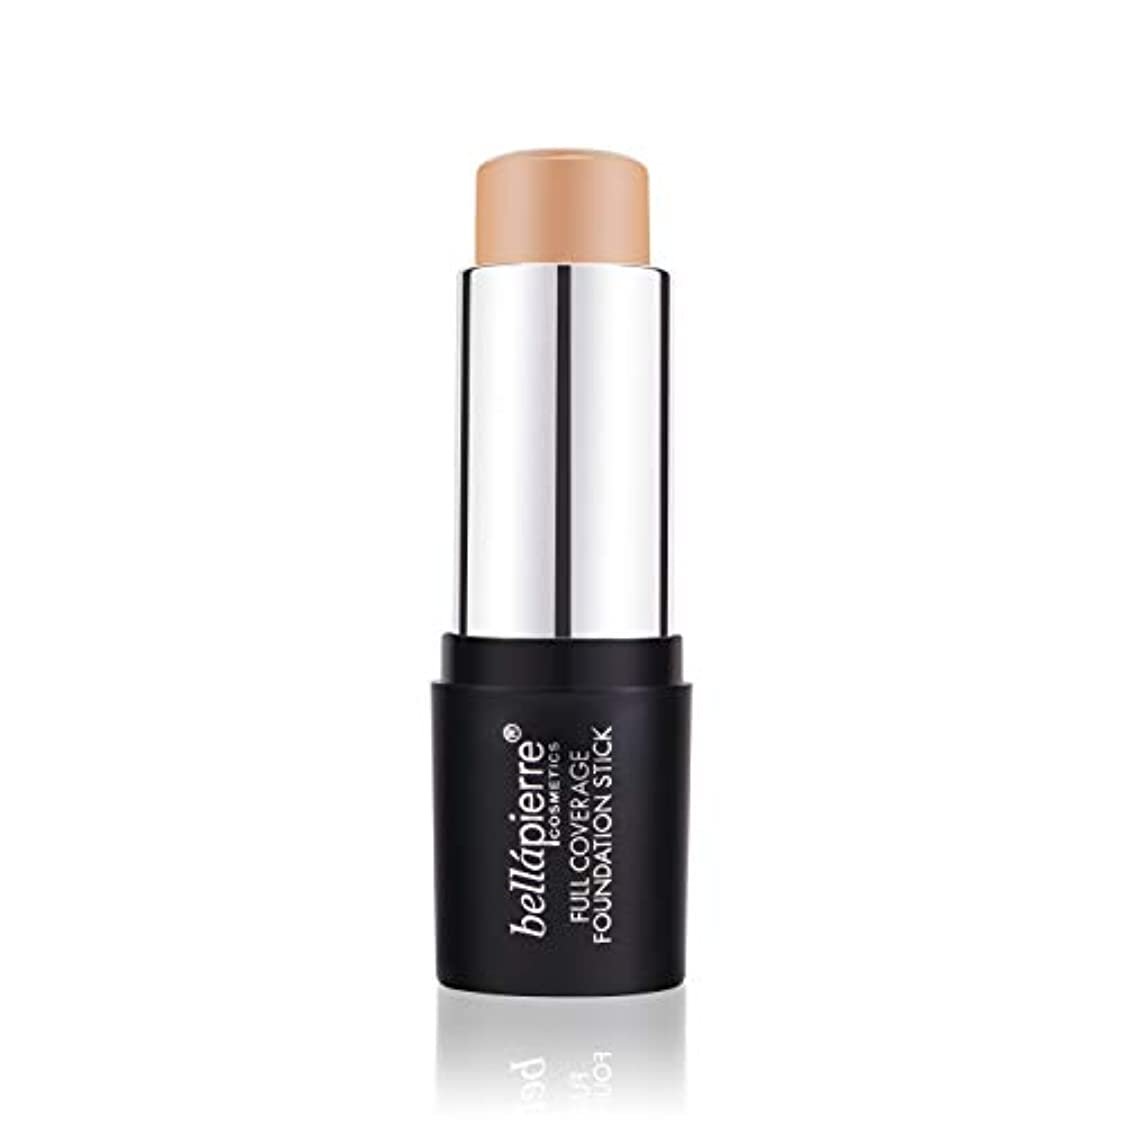 Bellapierre Cosmetics Full Coverage Foundation Stick - # Dark 10g/0.35oz並行輸入品